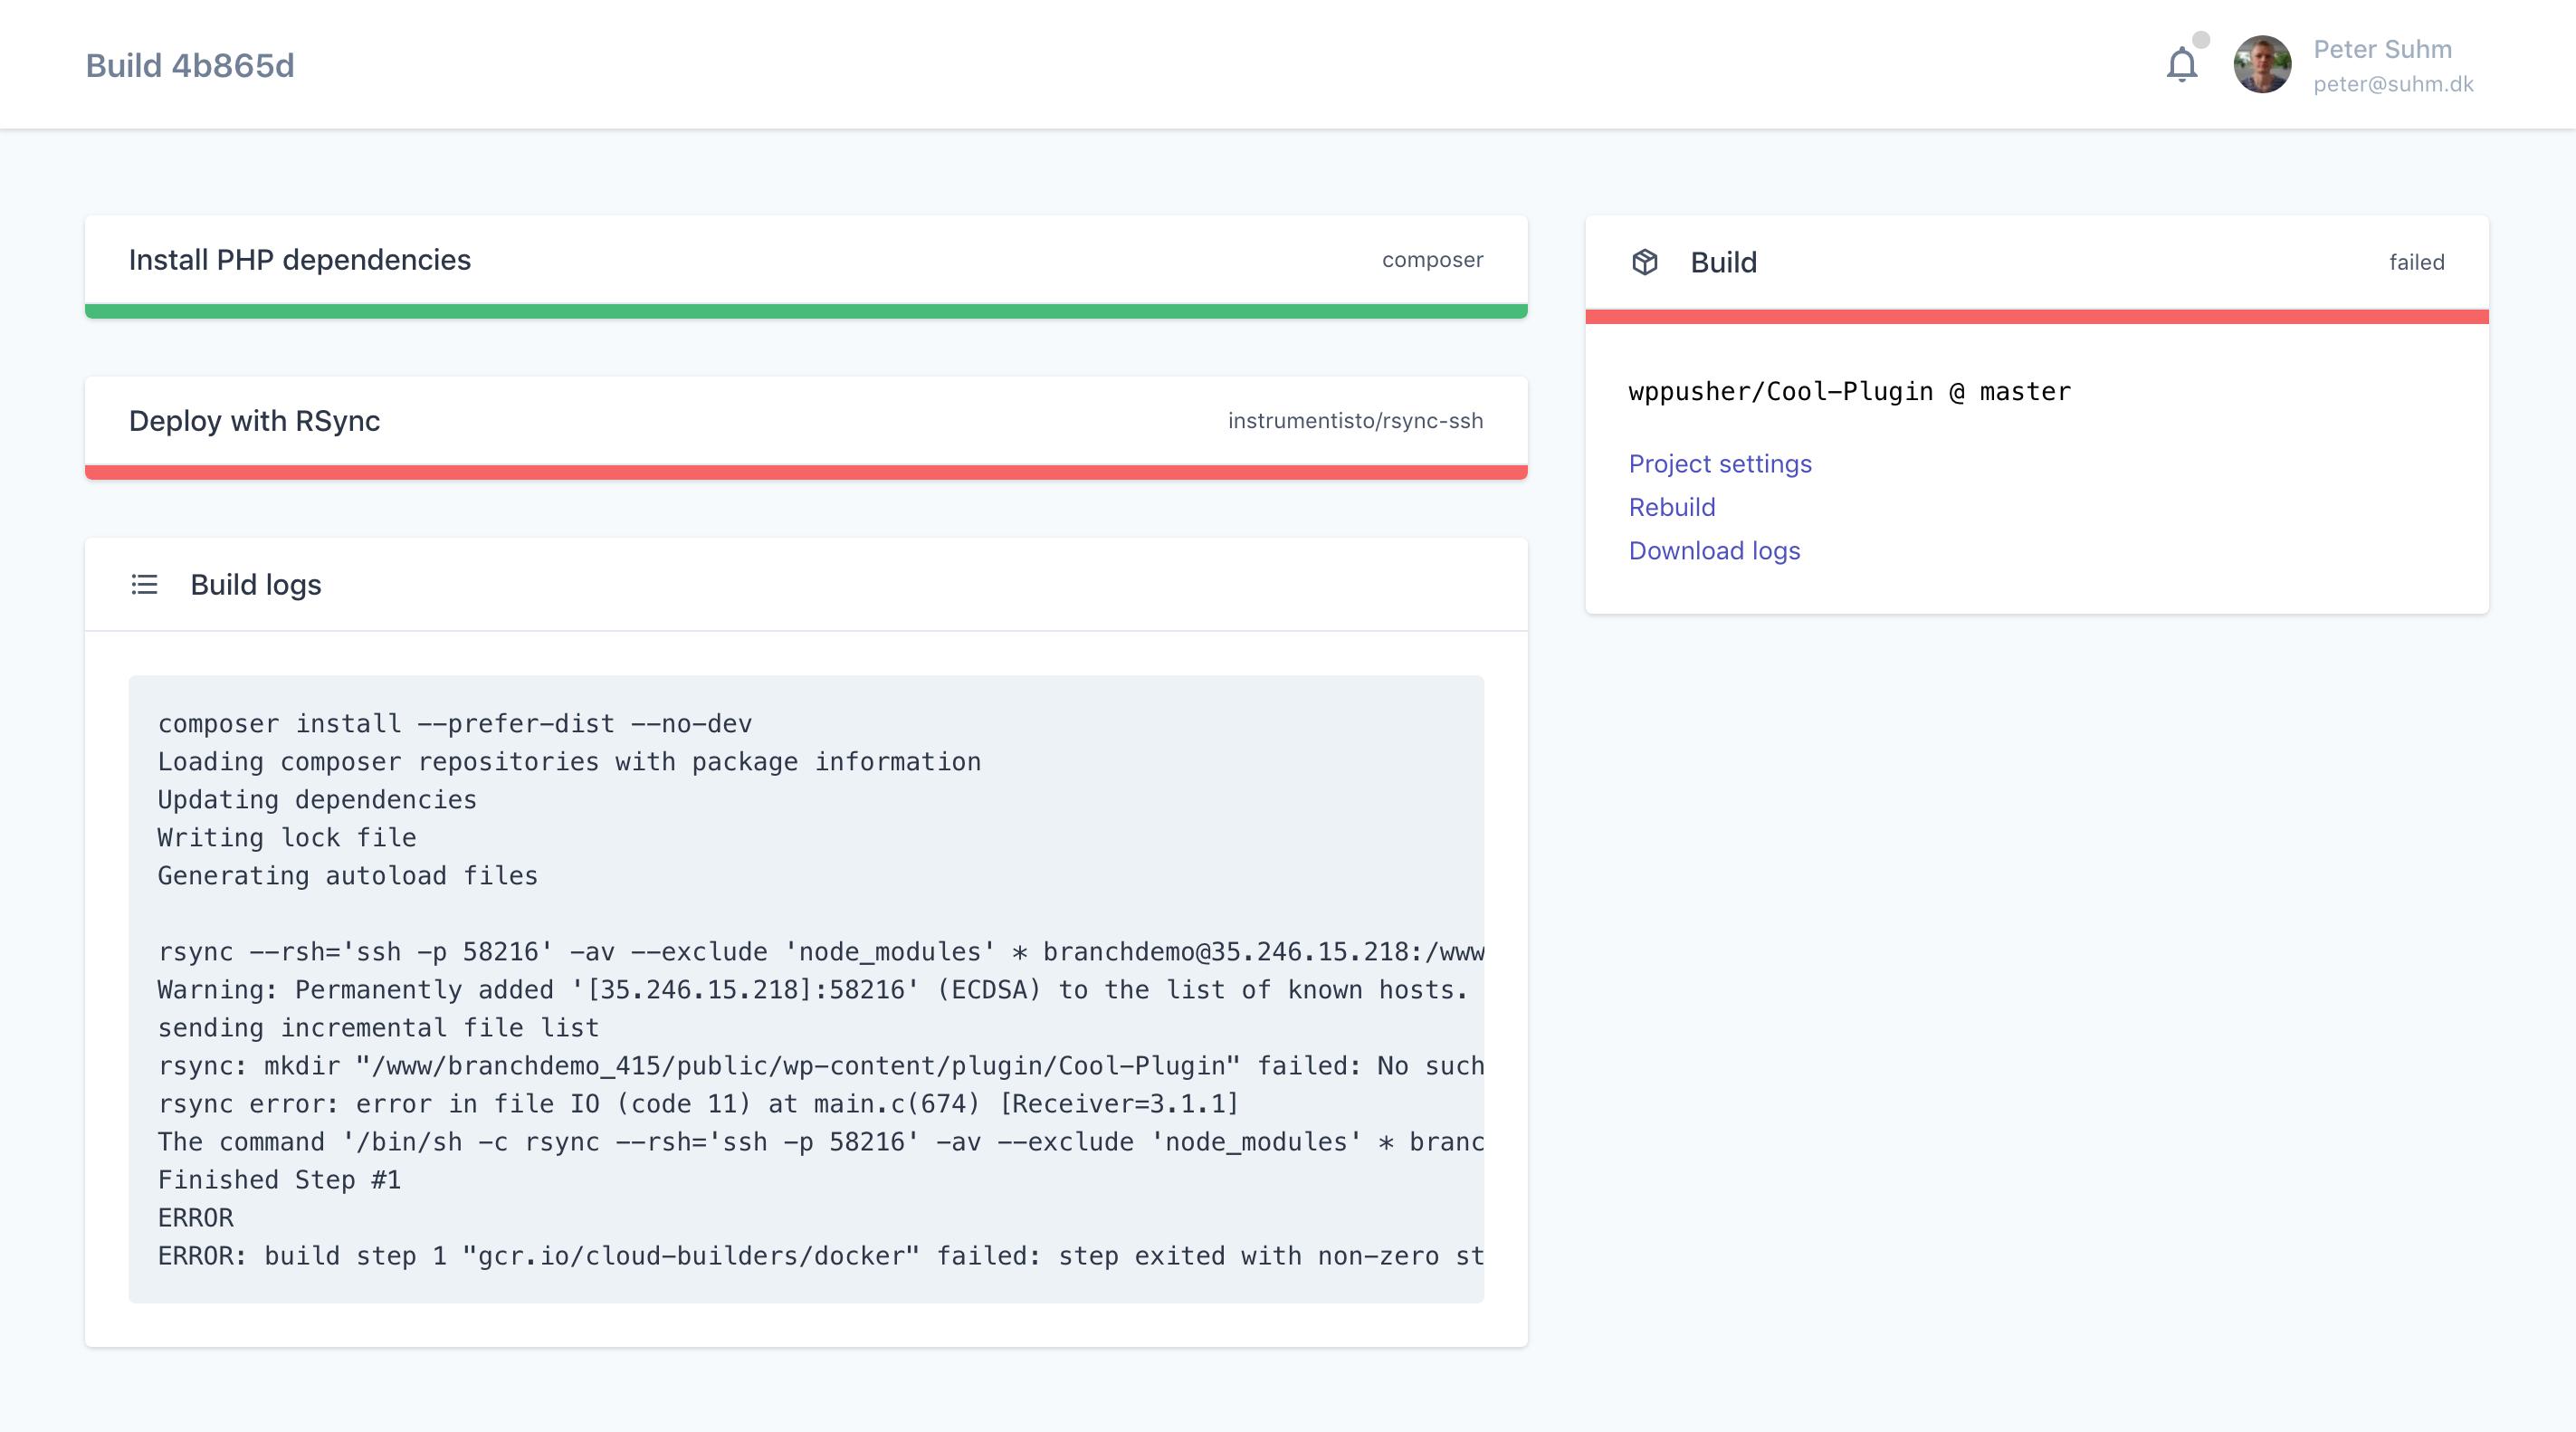 https://res.cloudinary.com/ddmezyu9v/image/upload/v1581586219/Documentation/SiteGround/siteground-plugin-failed-build_ste8wk.png